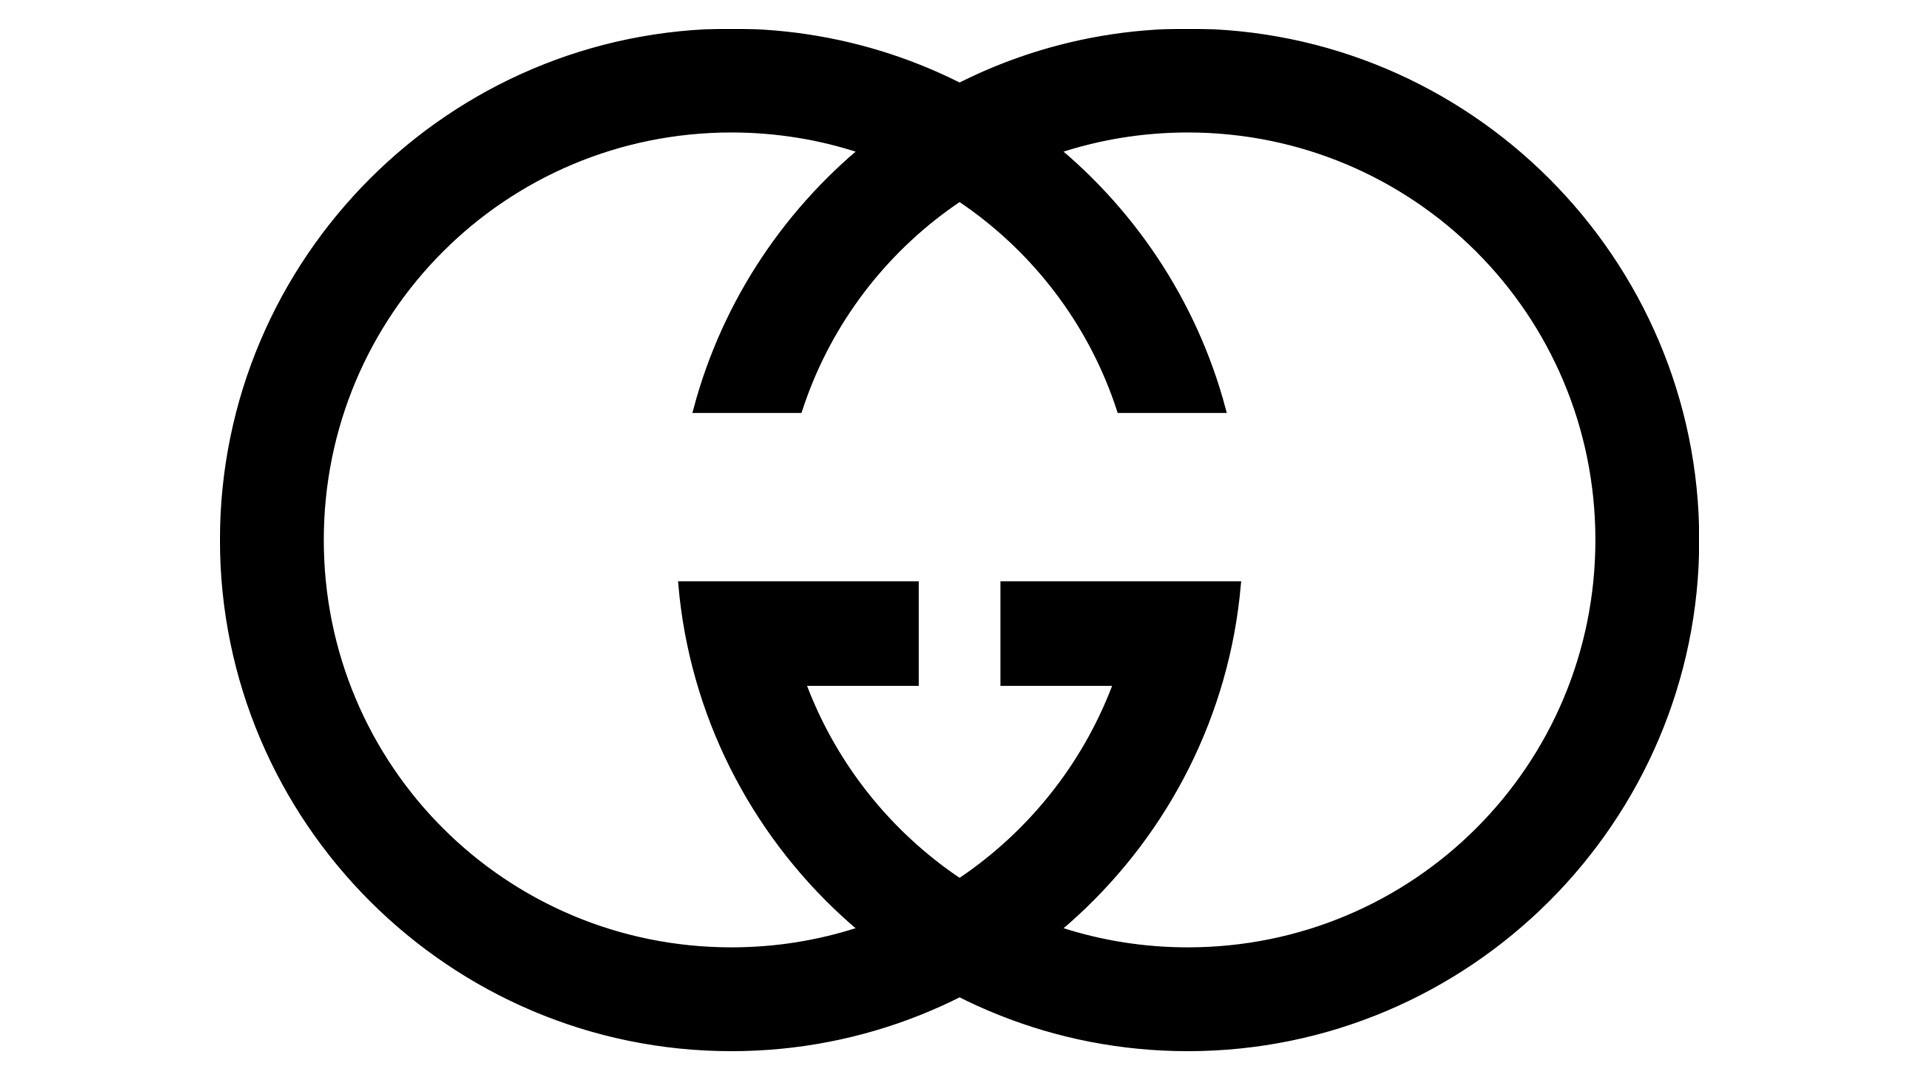 Les logos (11)